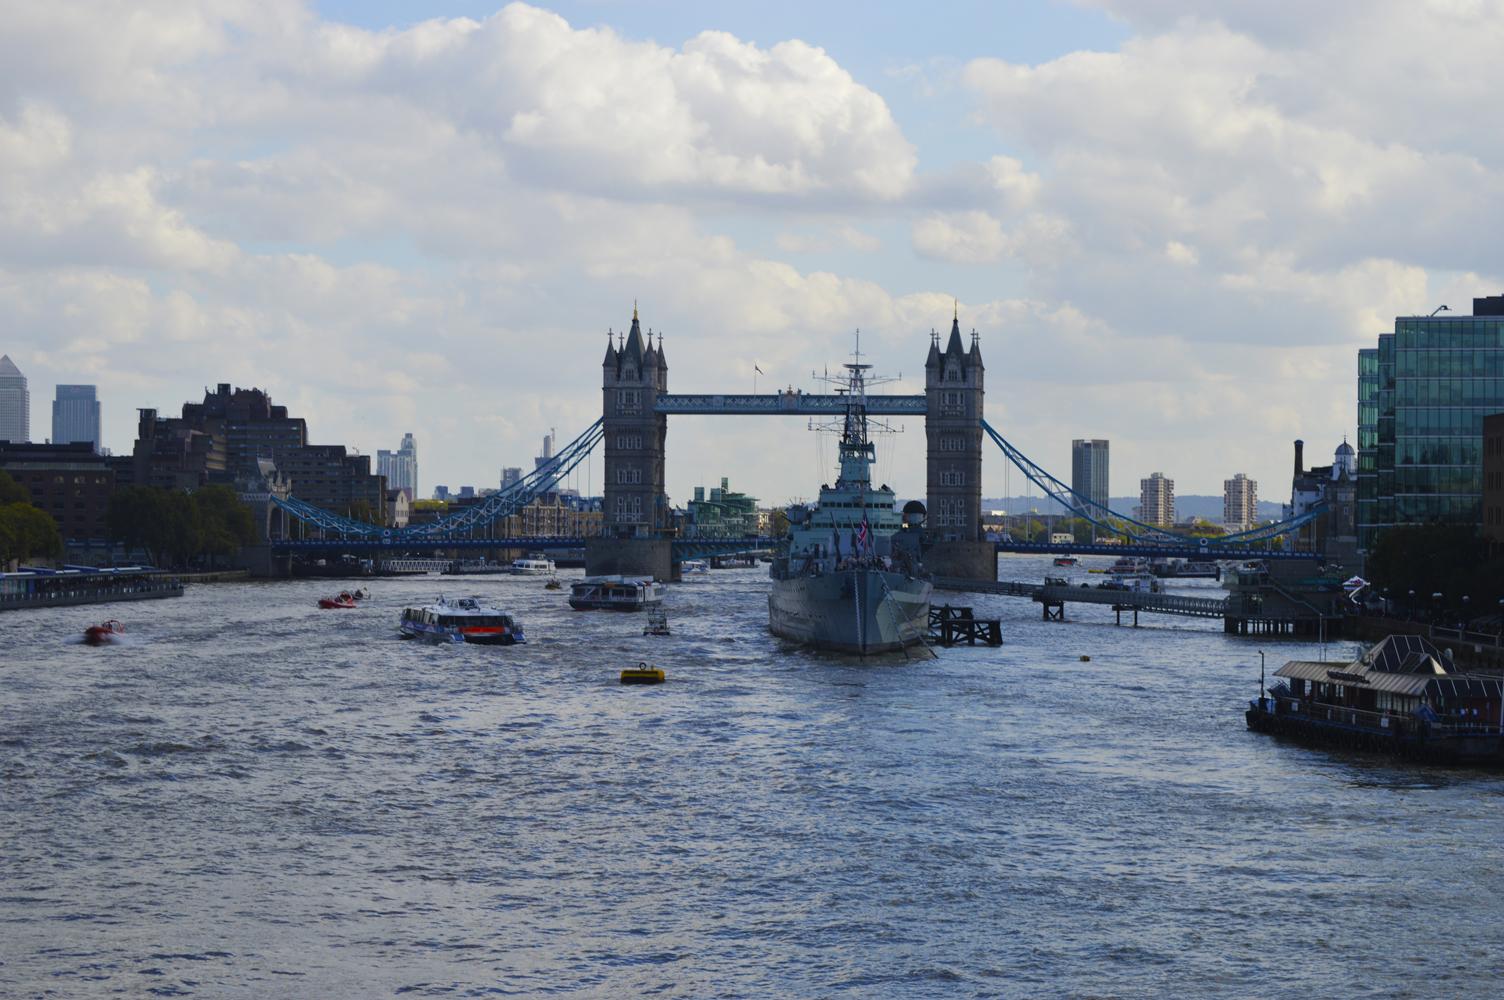 135 Tower Bridge. 26.09.2015